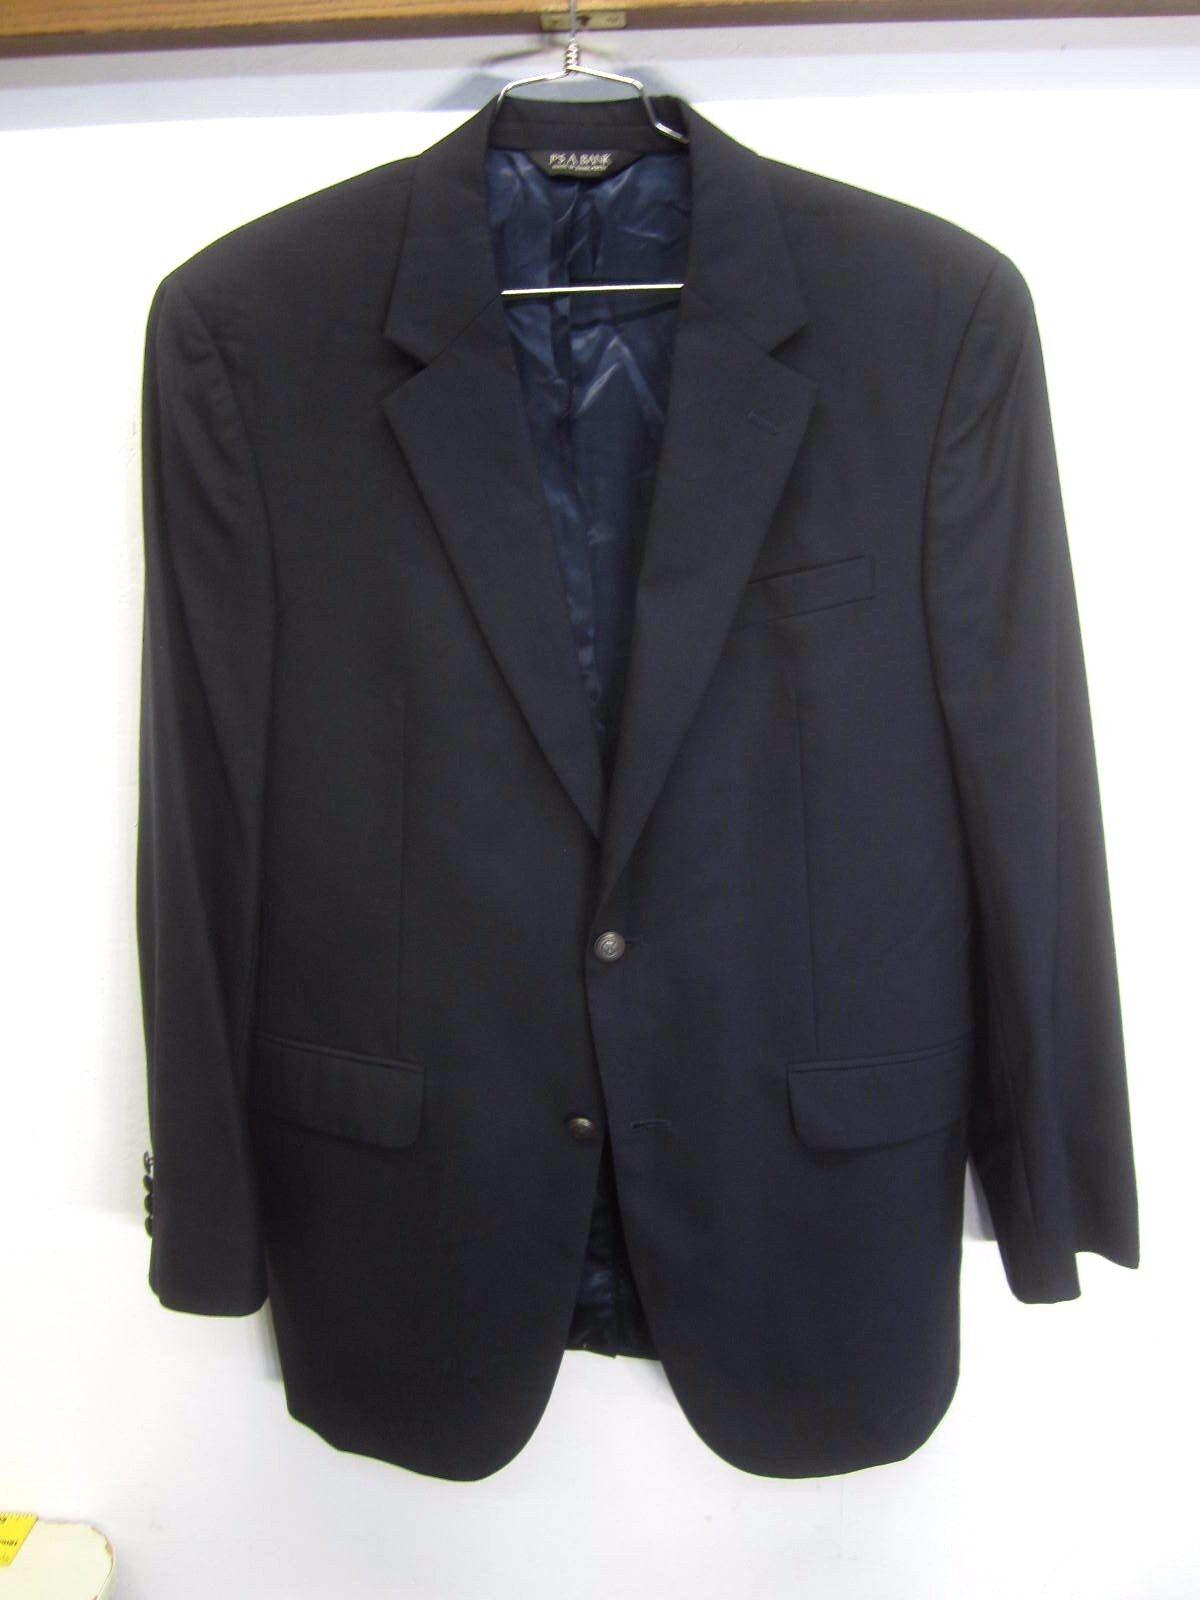 NWOT Jos. A. Bank Blazer Sport Coat navy Blau 2 btn wool sz 42L